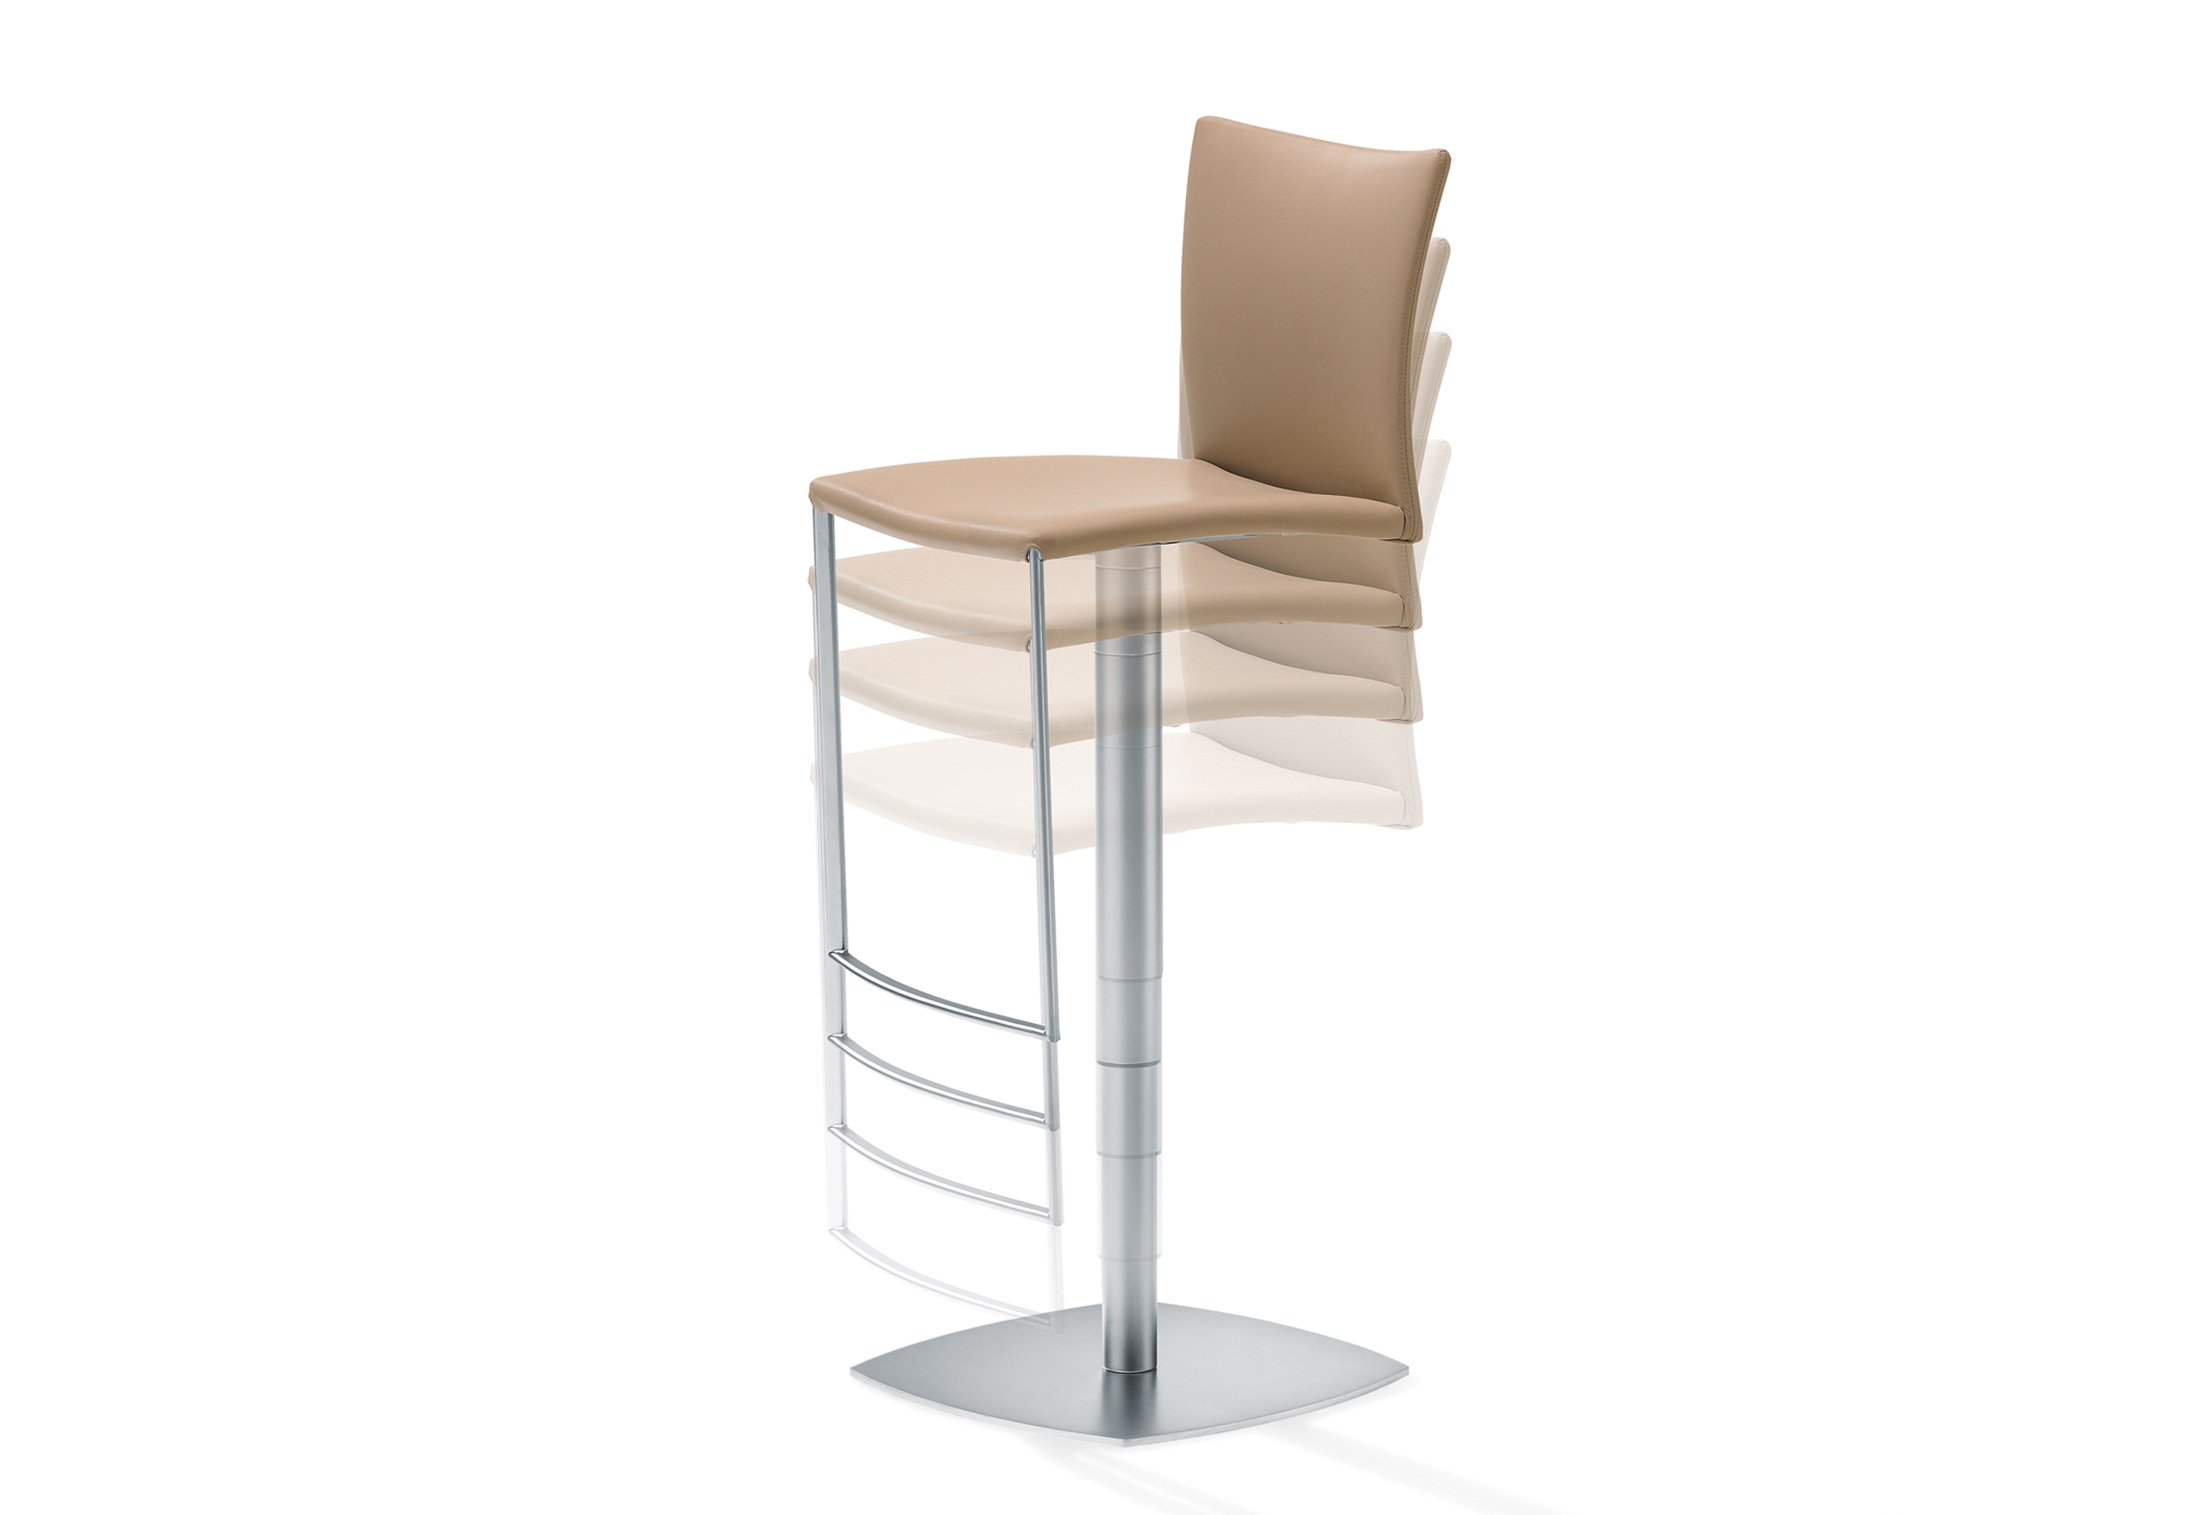 2079 ii nobile soft barhocker von draenert stylepark. Black Bedroom Furniture Sets. Home Design Ideas